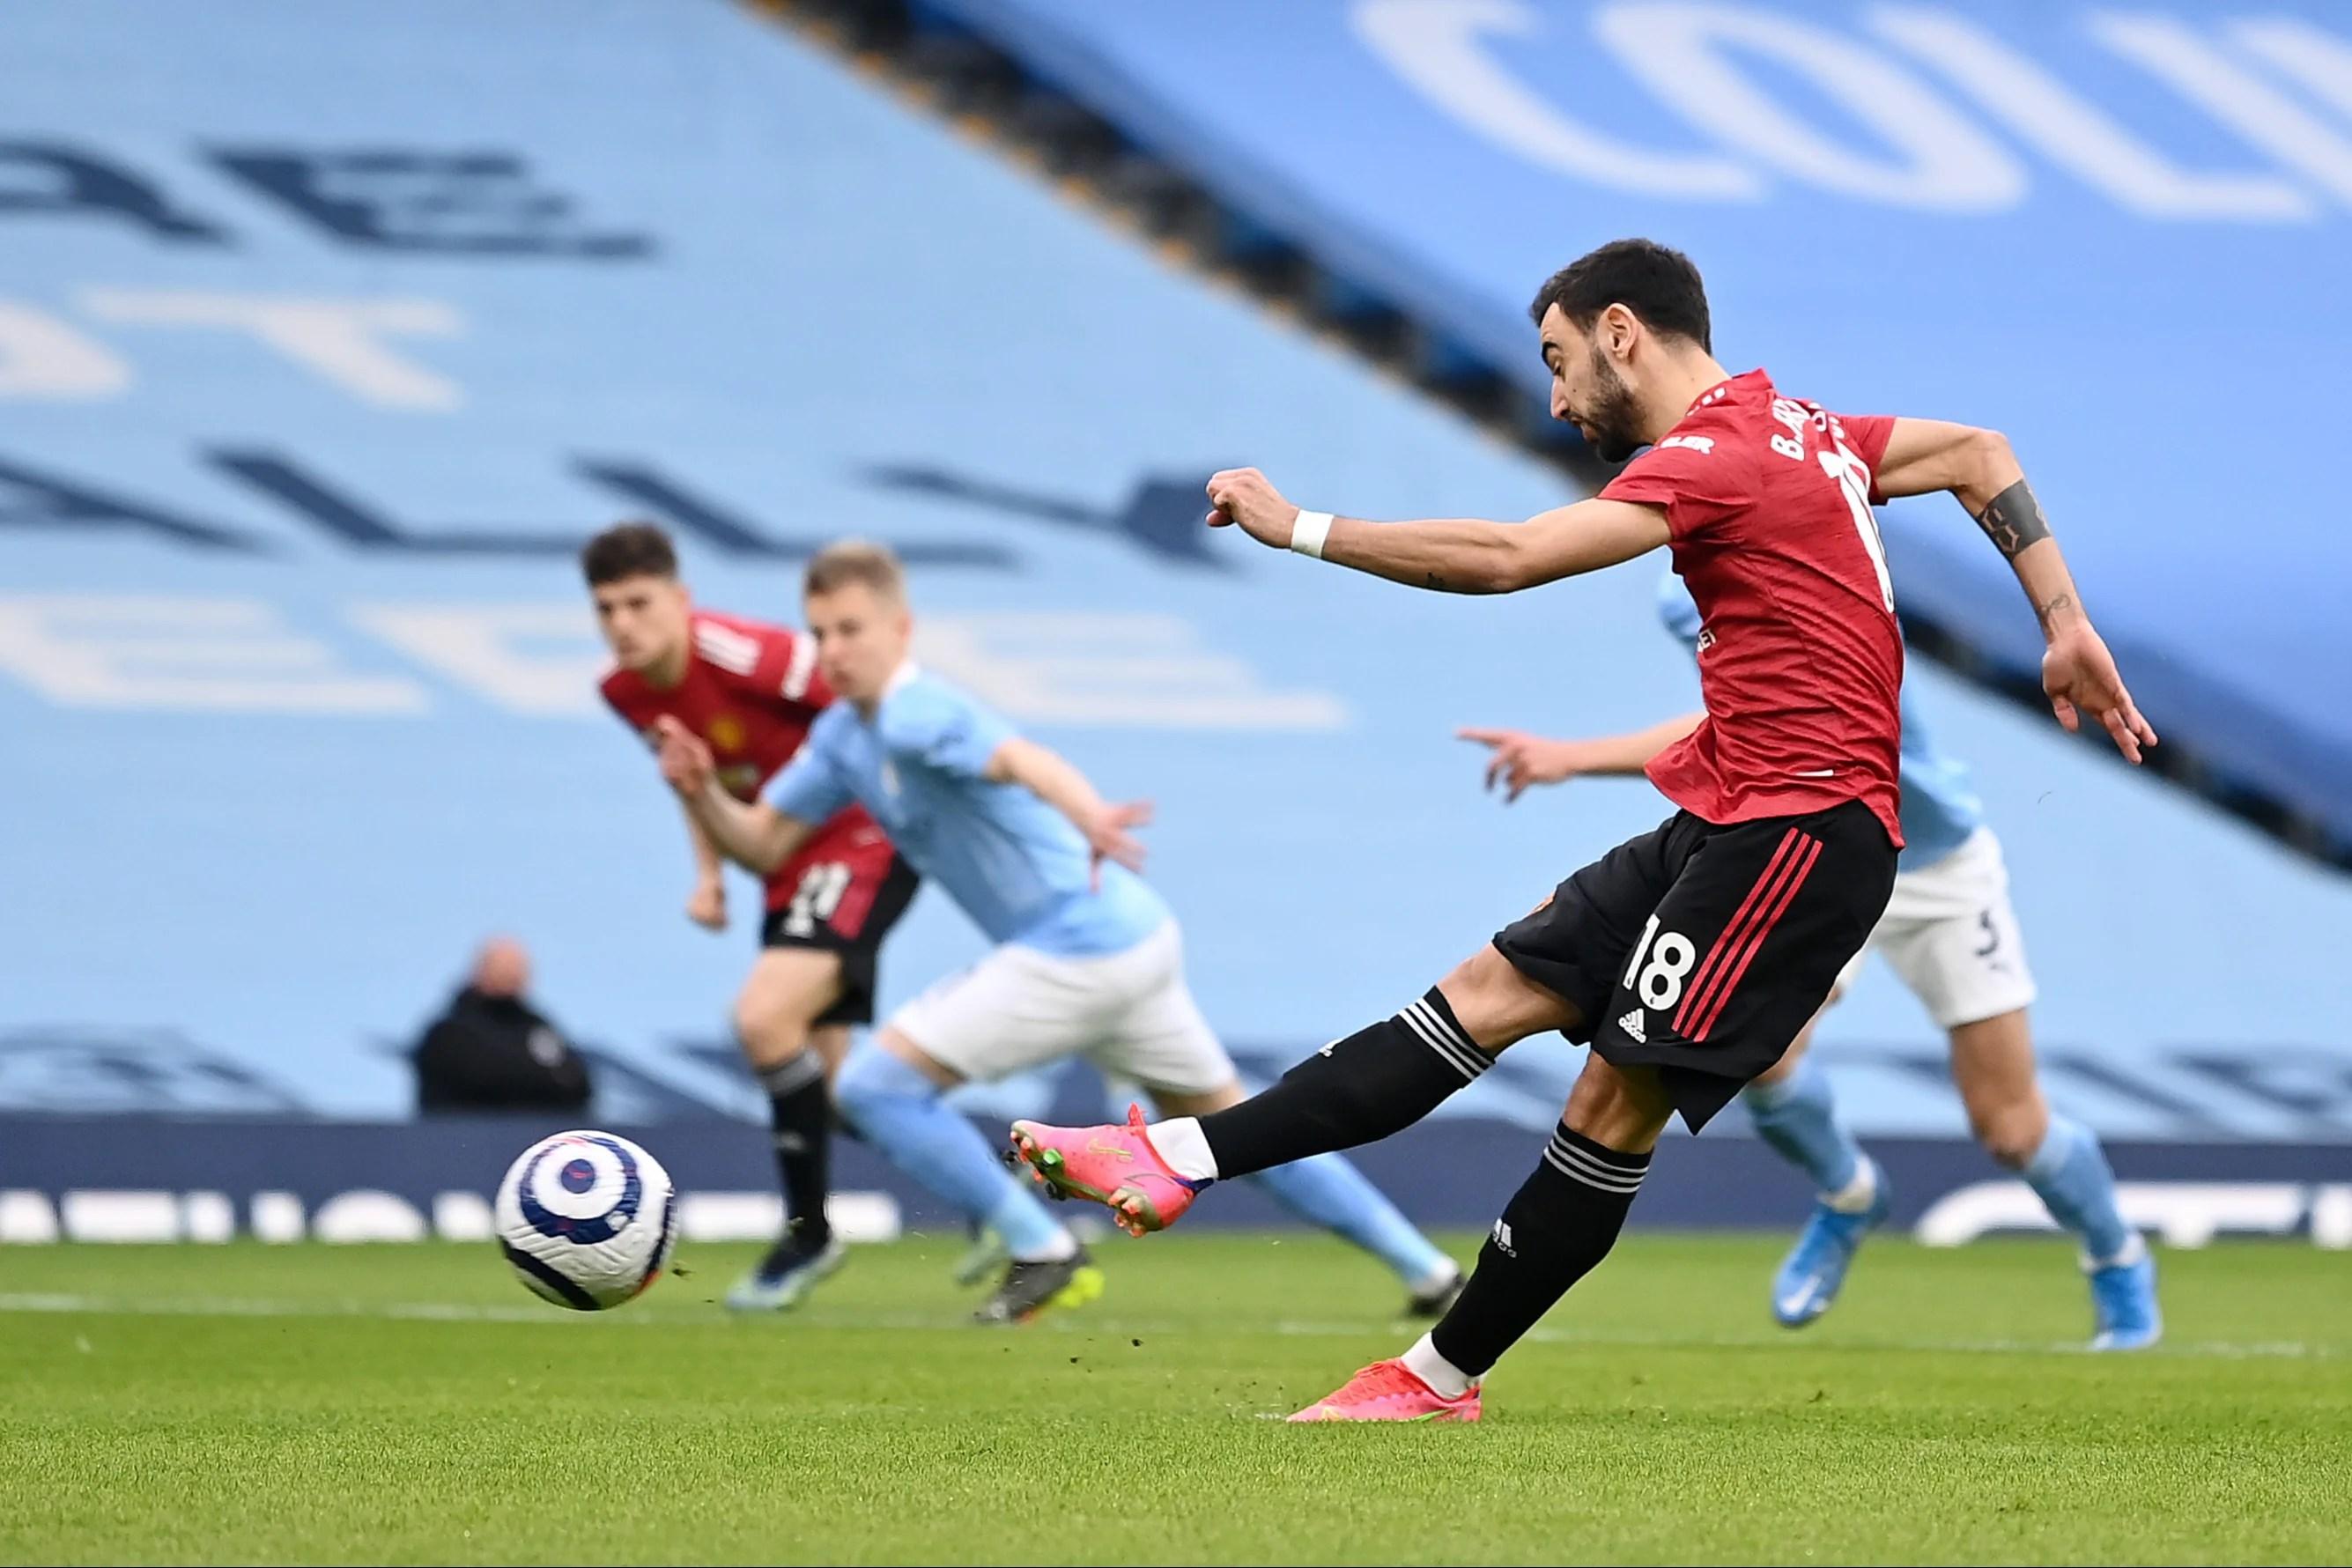 Man City 0-2 Man United LIVE! Manchester derby match result - Bruno  Fernandes and Shaw goals end City run   Evening Standard